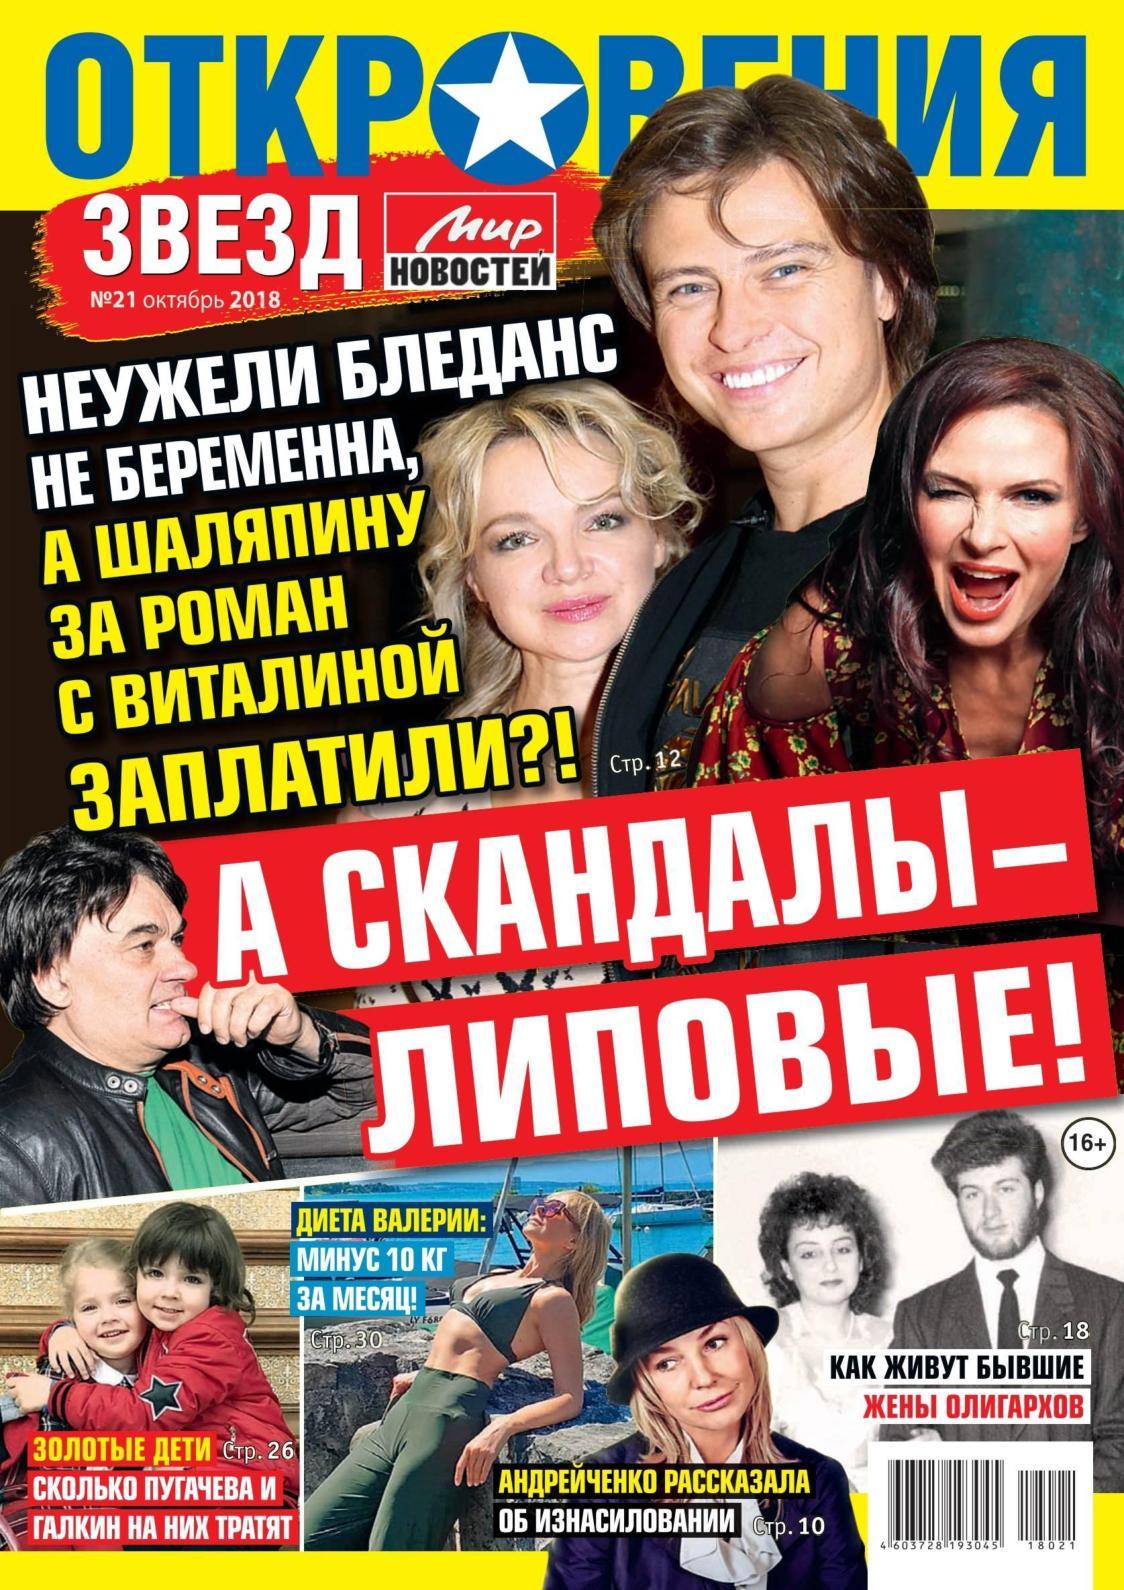 Travel news magazine (ukraine) № 11-12, 2018 food & wine issue.